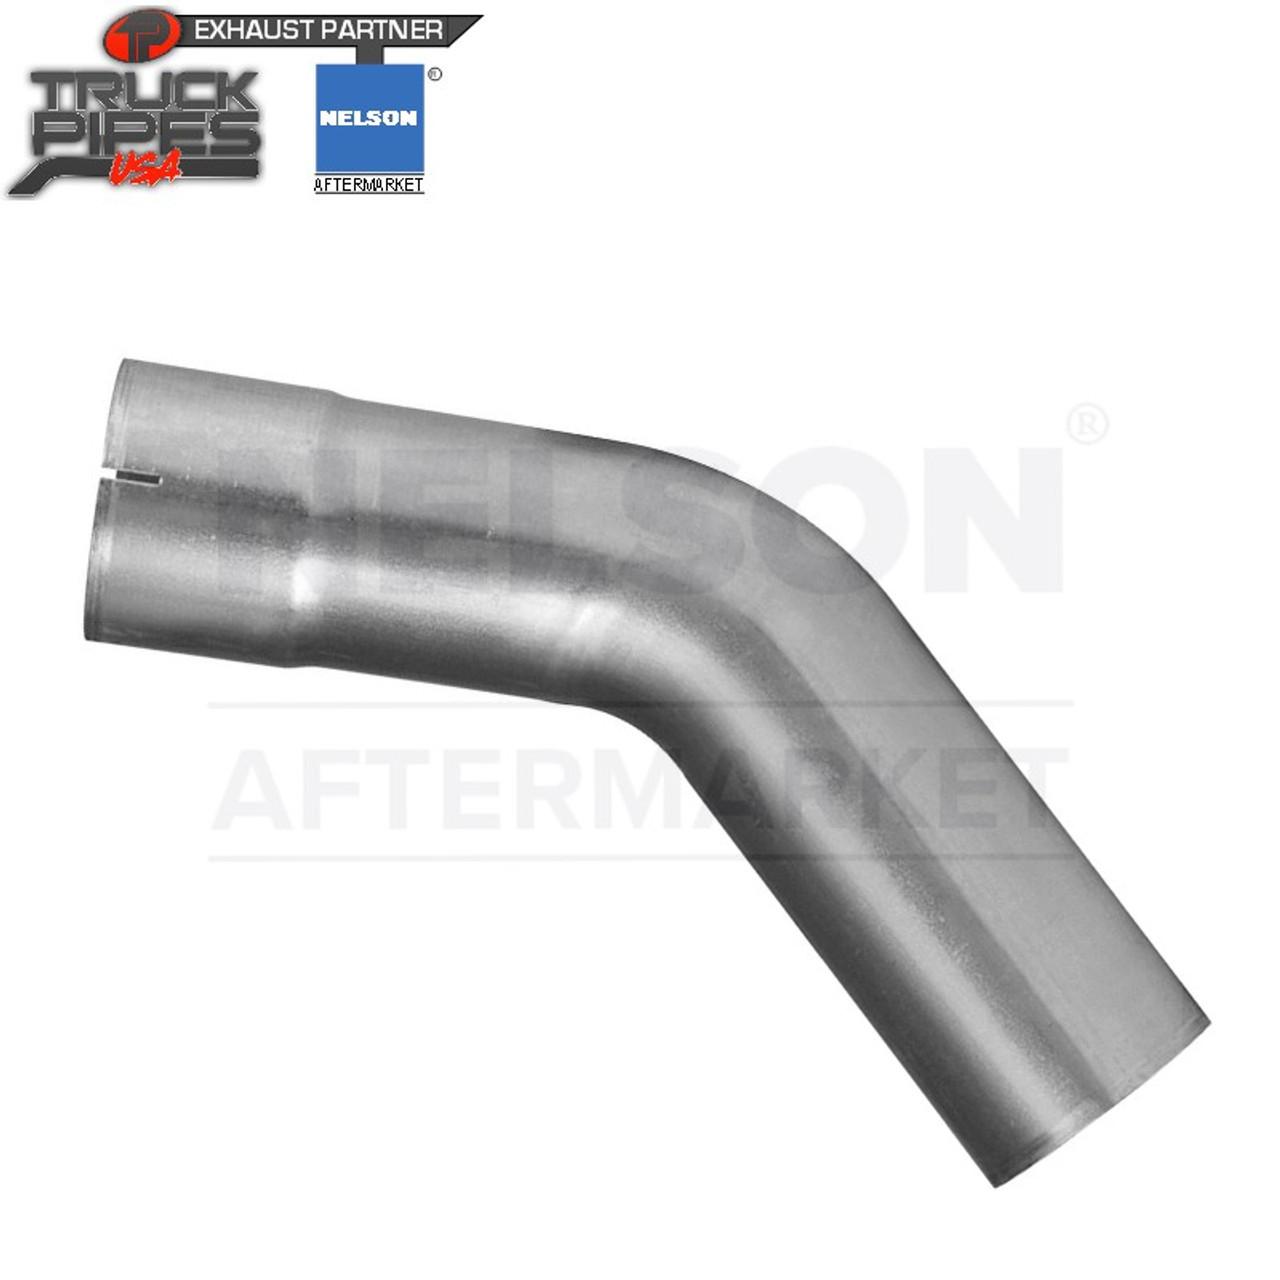 "4"" OD-ID 45 Degree Exhaust Elbow Aluminized x 9.3"" Leg Length Nelson 900064A"